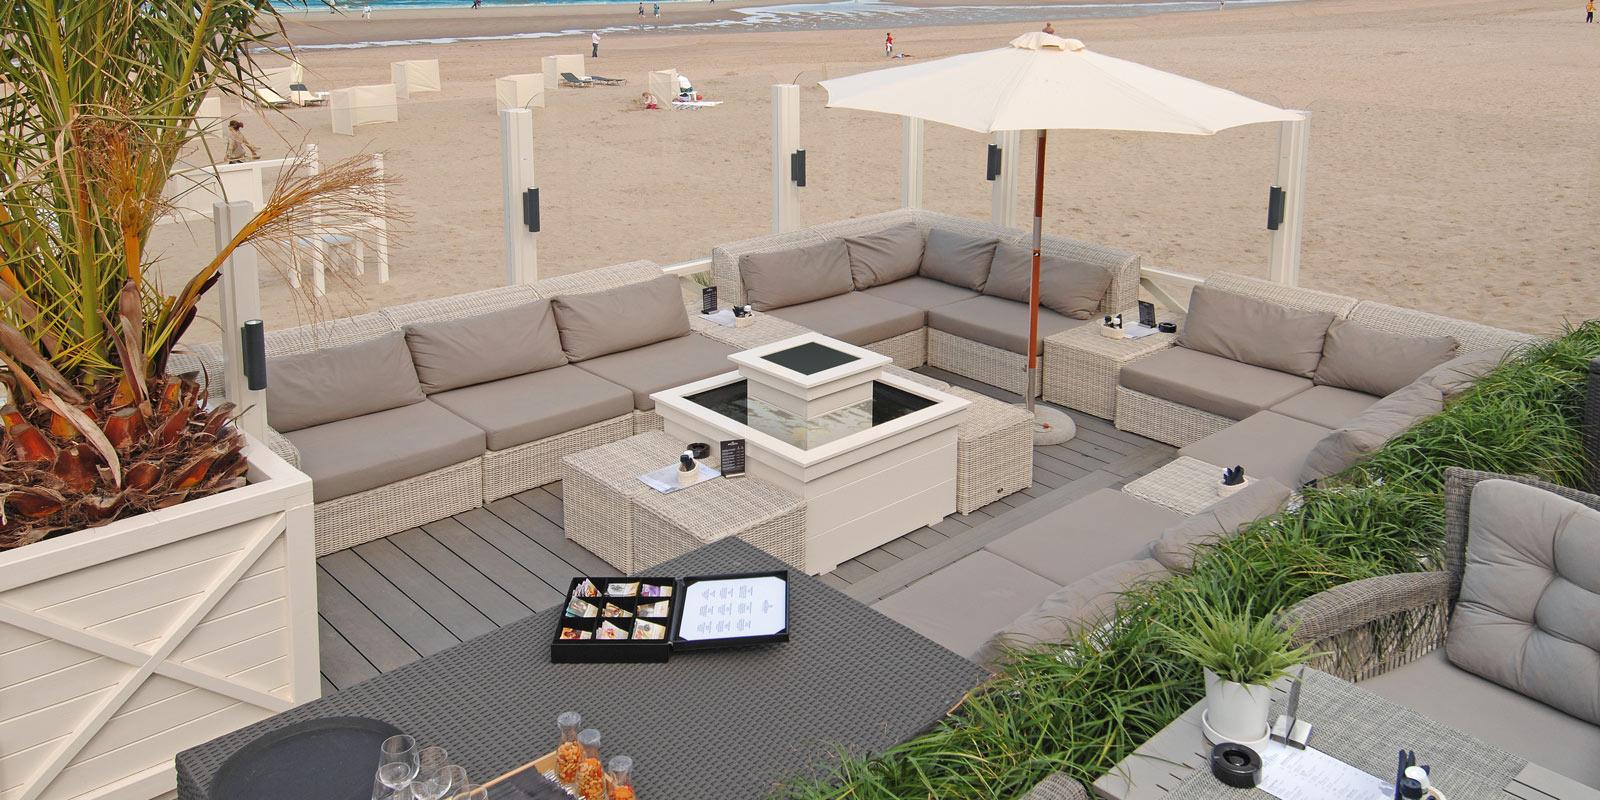 meubilair voor buiten, borek, terras meubilair